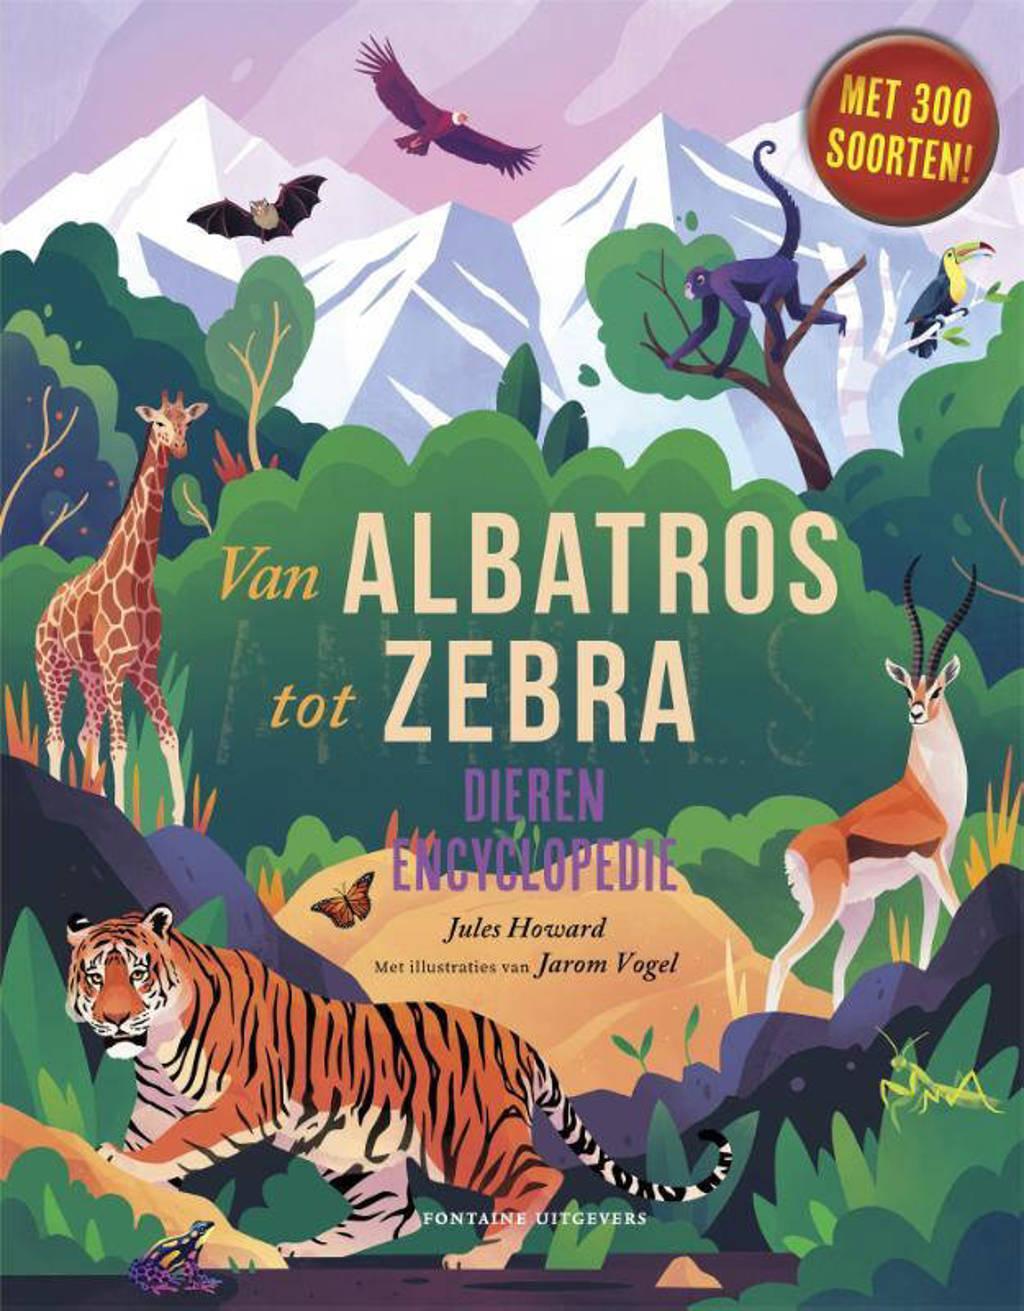 Van albatros tot zebra - Jules Howard